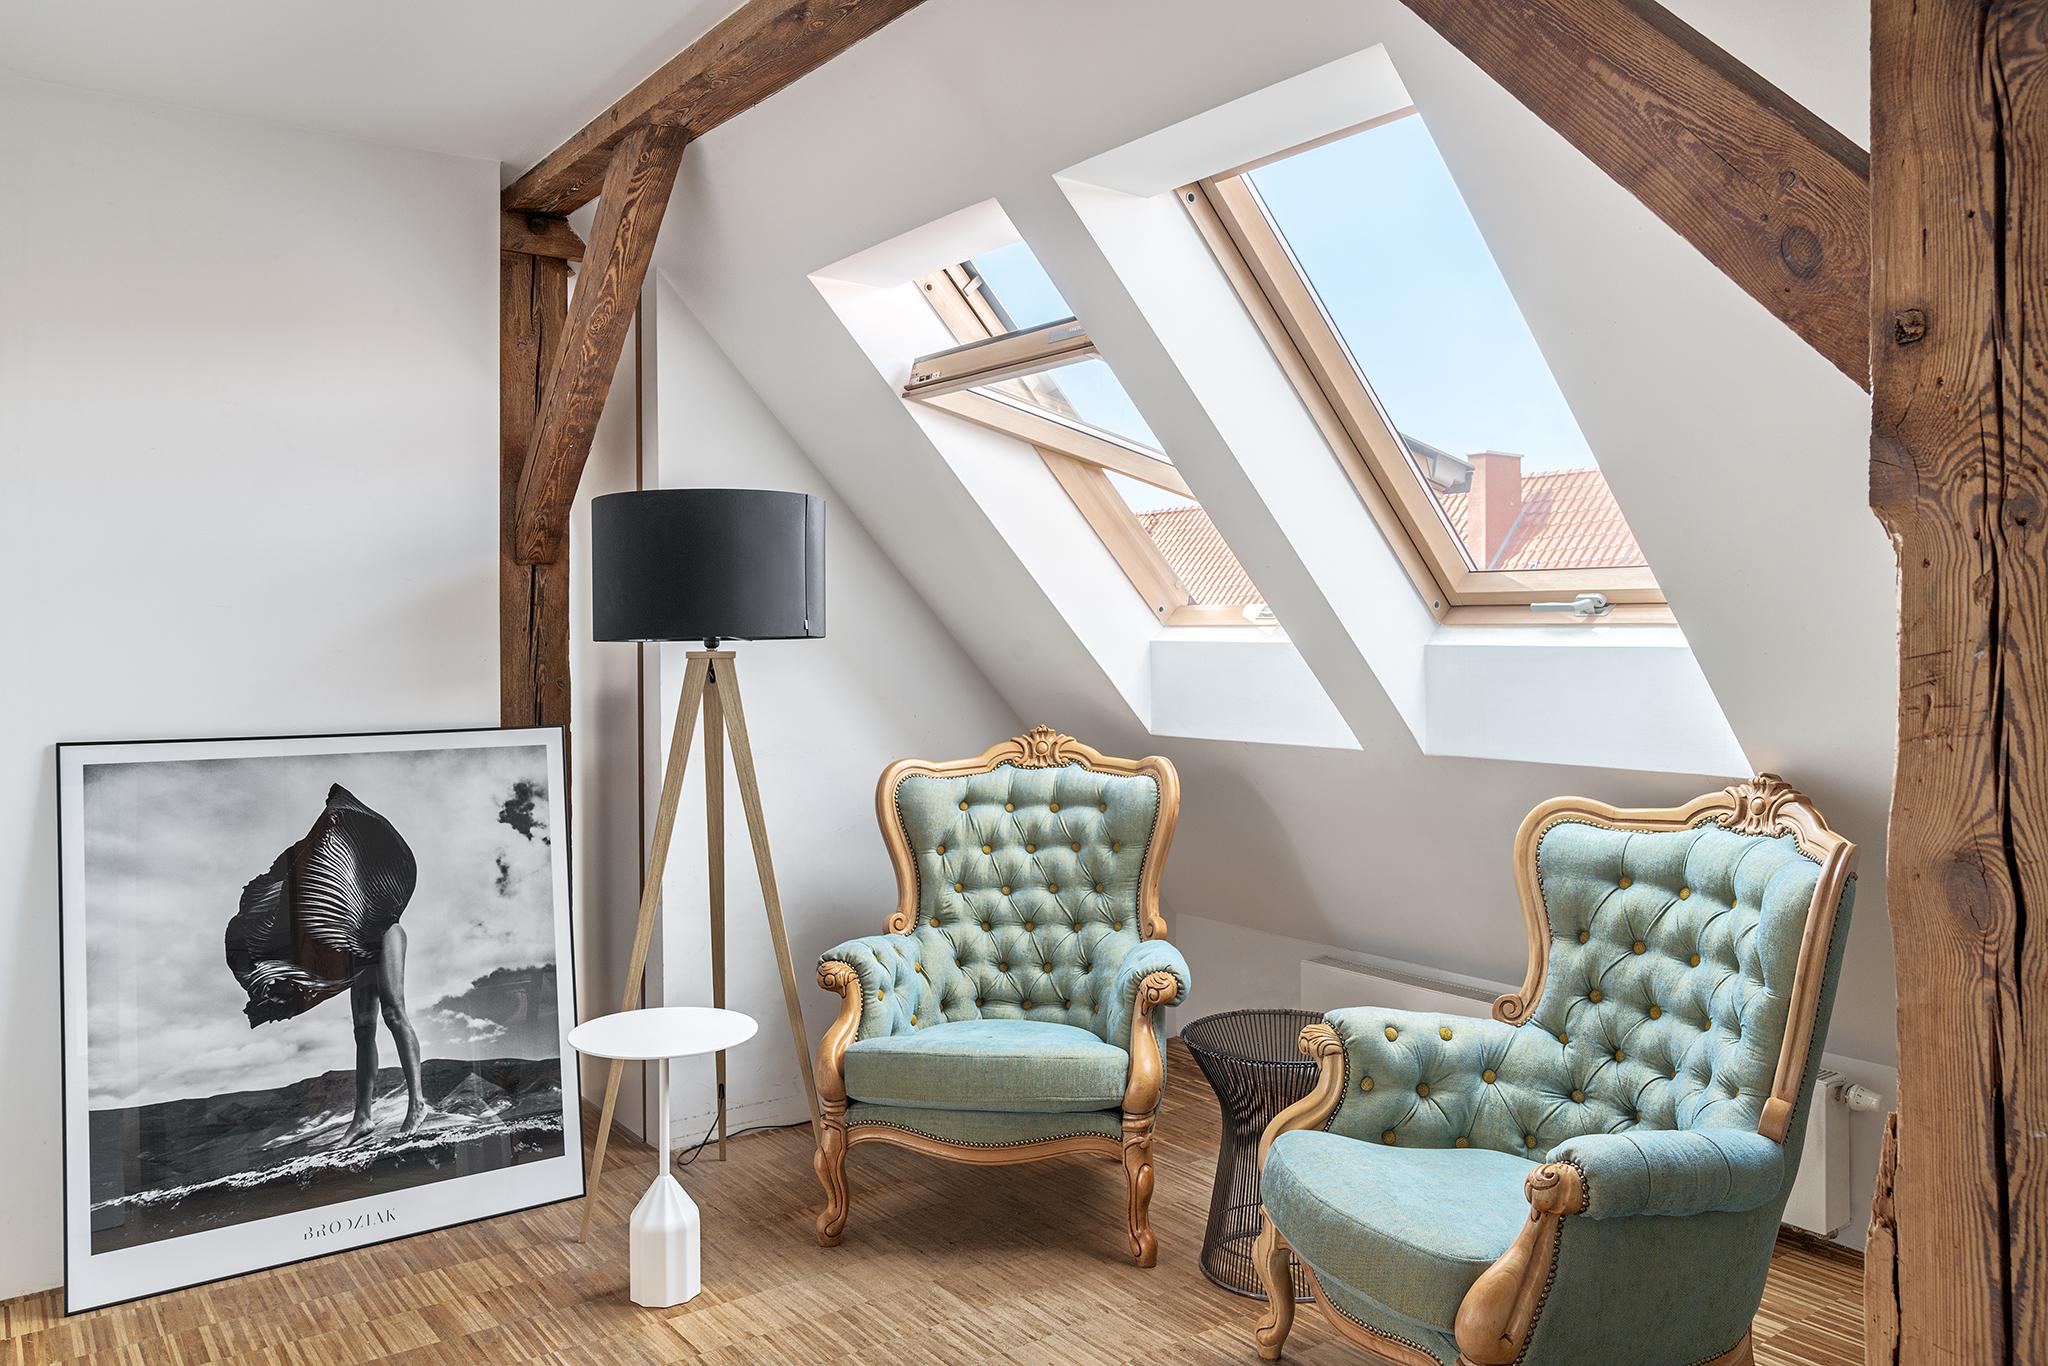 Roof Windows in Room